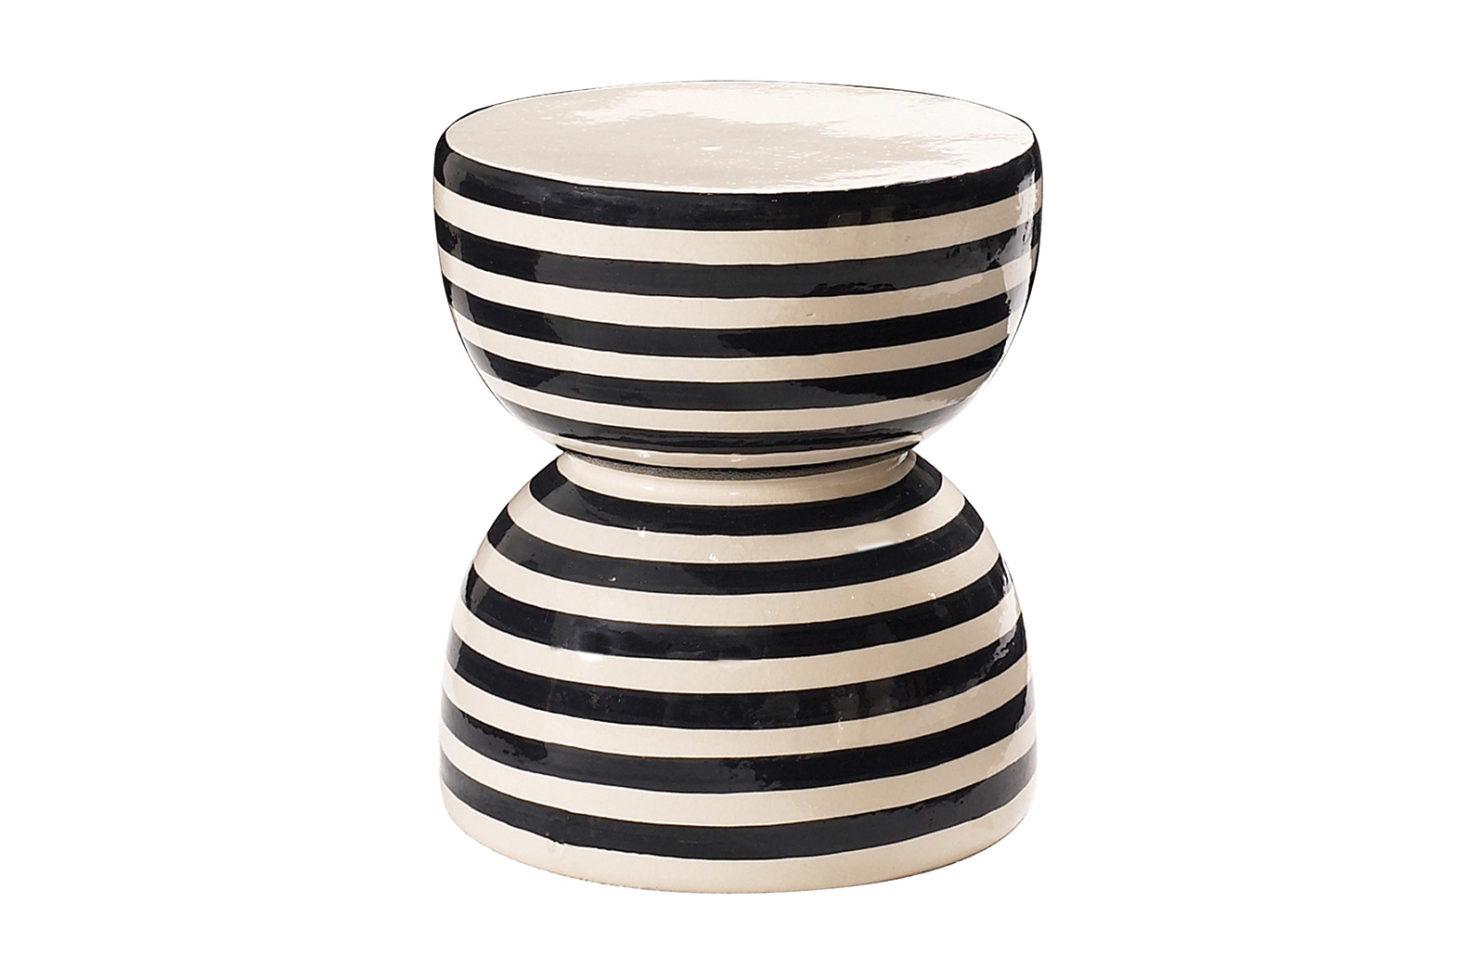 Ceramic Time 308FT350P2WBC